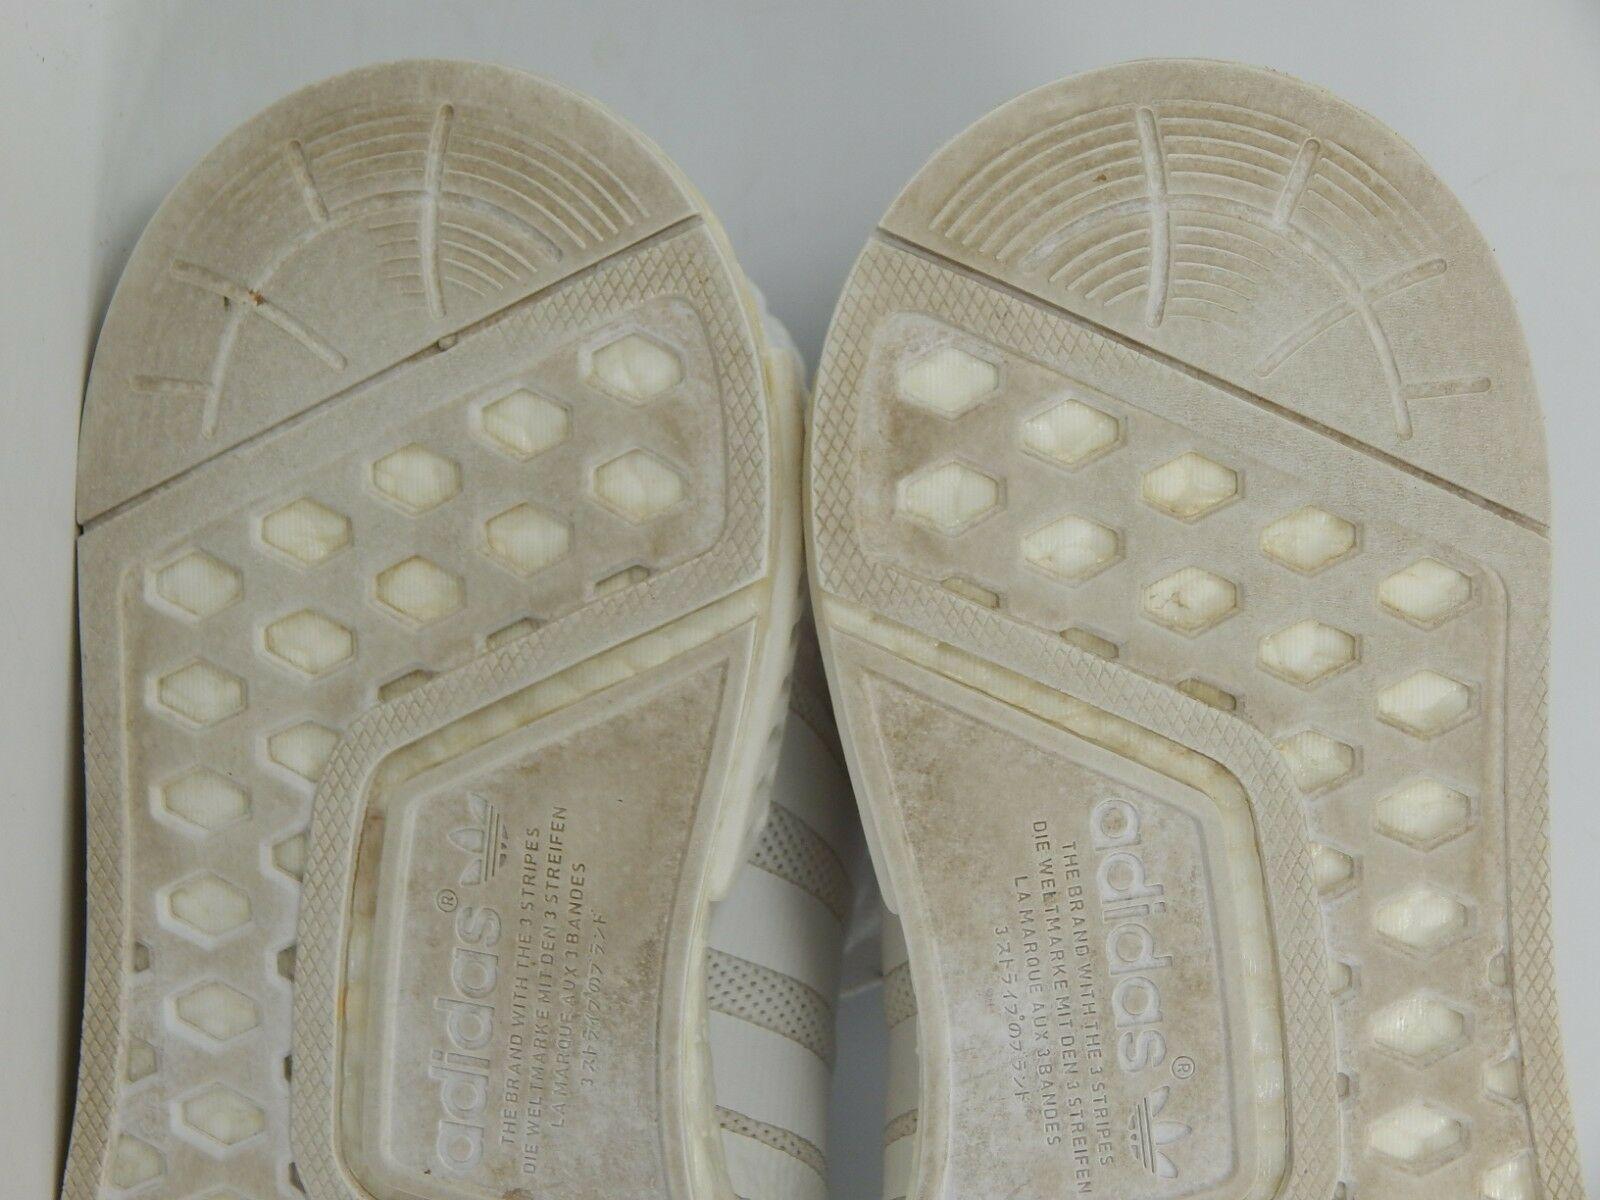 Adidas Nmd R1 Dreifach Weiß Größe 5 M (Y) EU 37 1/3 Jugend Laufschuhe Ba7245